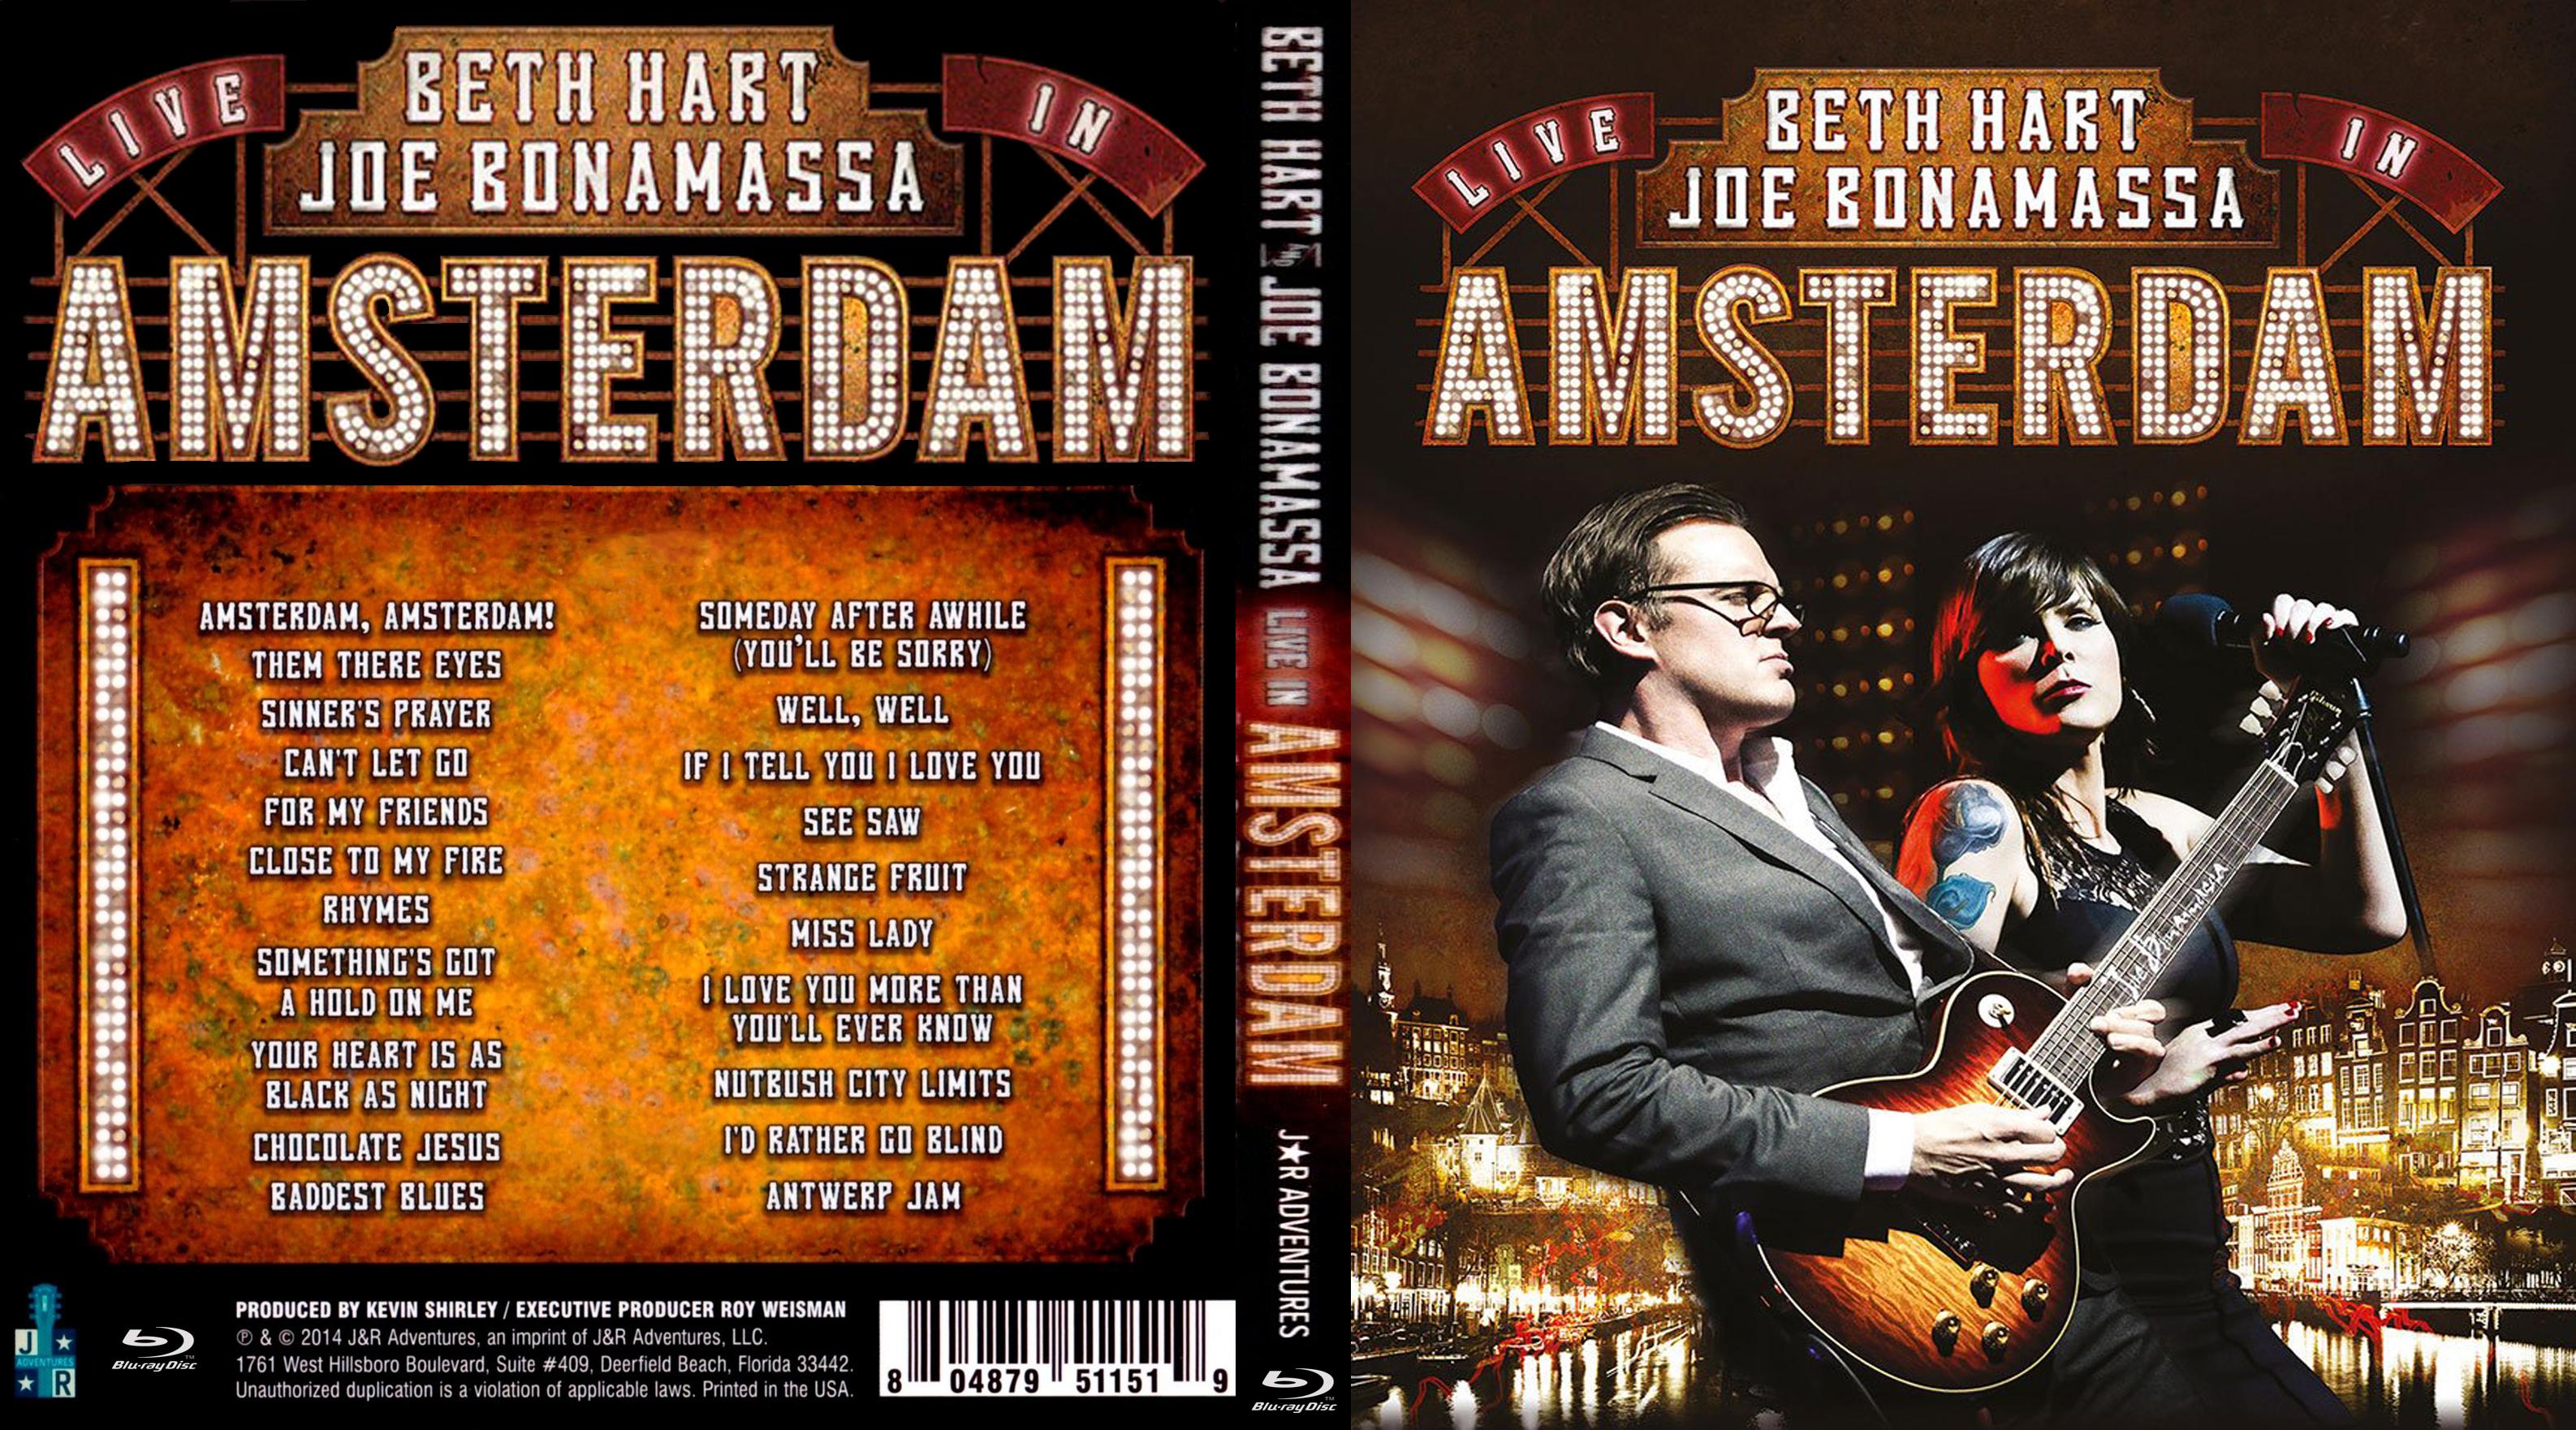 Live in Amsterdam (Beth Hart and Joe Bonamassa album